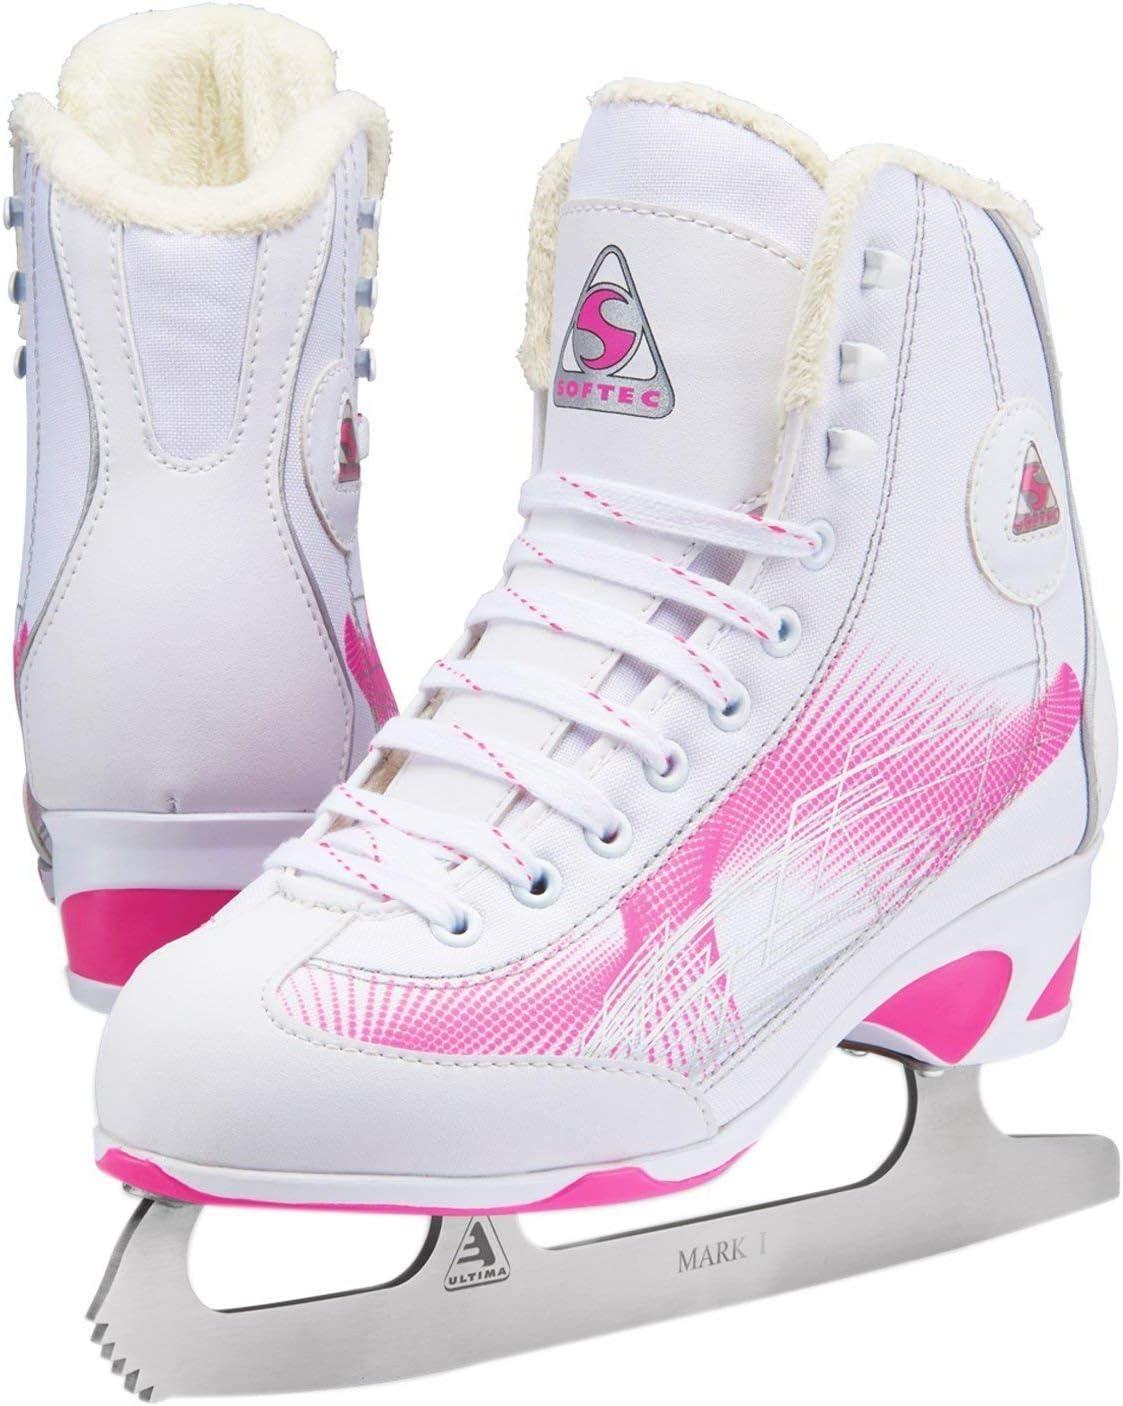 Jackson Ultima Figure Skates - Rave レディース RV2000 ピンク 幅 ミディアム  Adult Medium 7